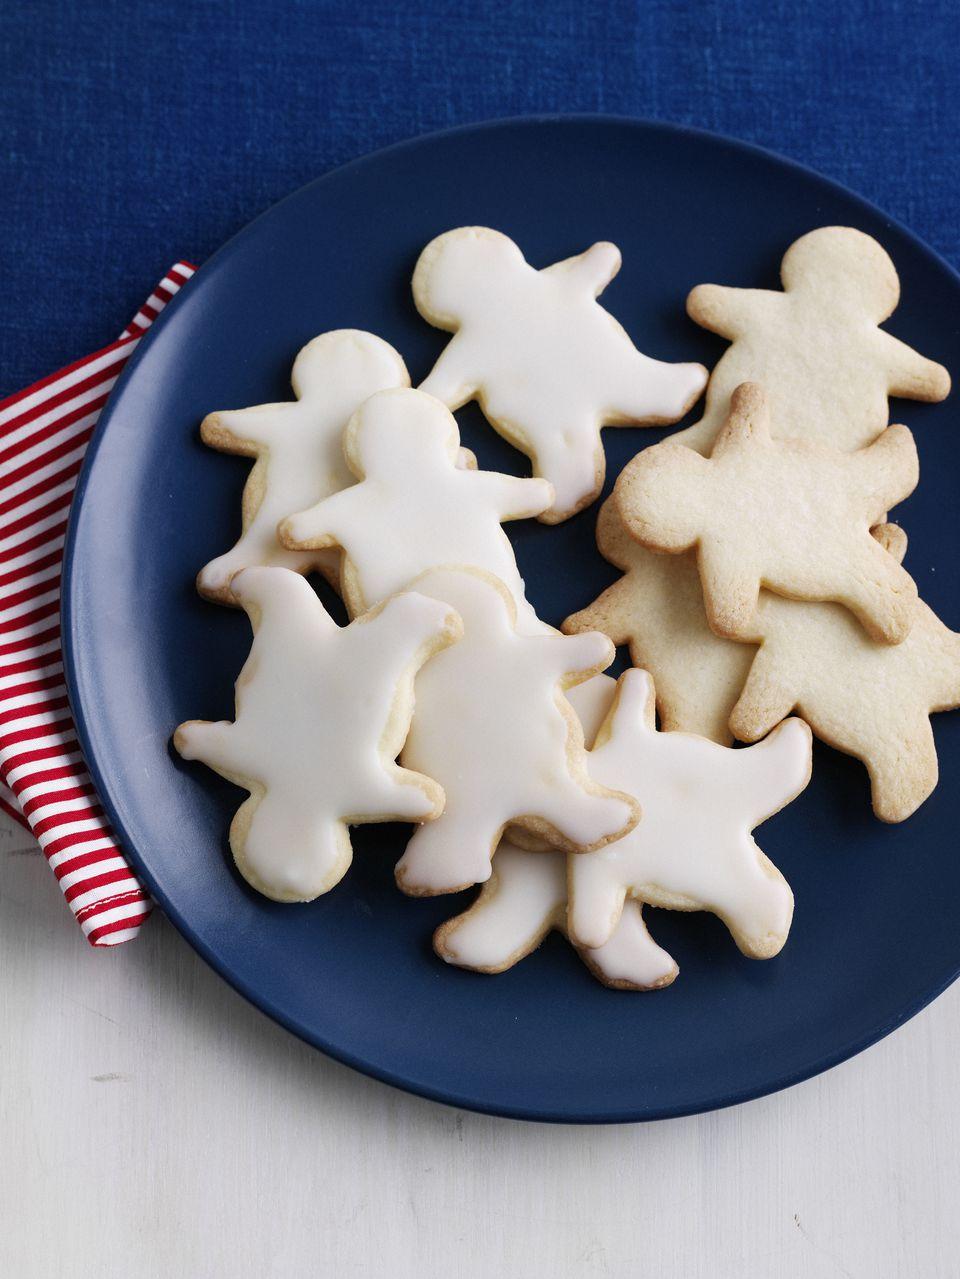 Plate of decorative sugar cookies